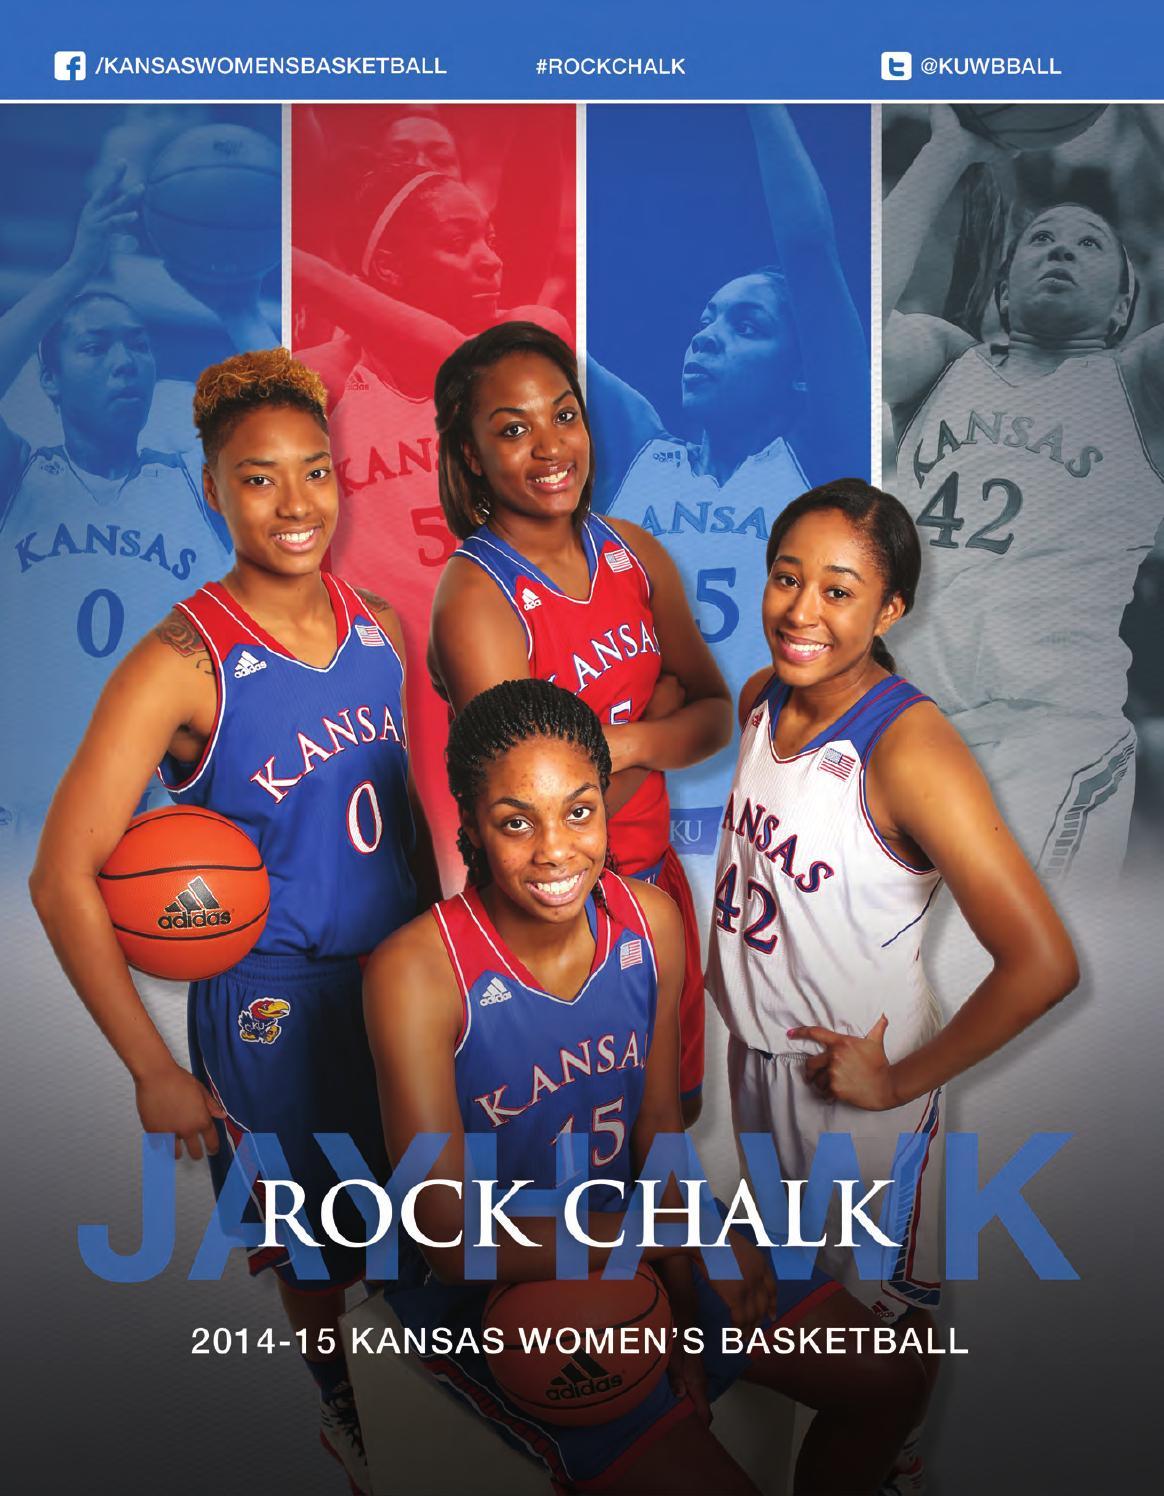 2014-15 Women's Basketball Guide by Kansas Athletics - Issuu